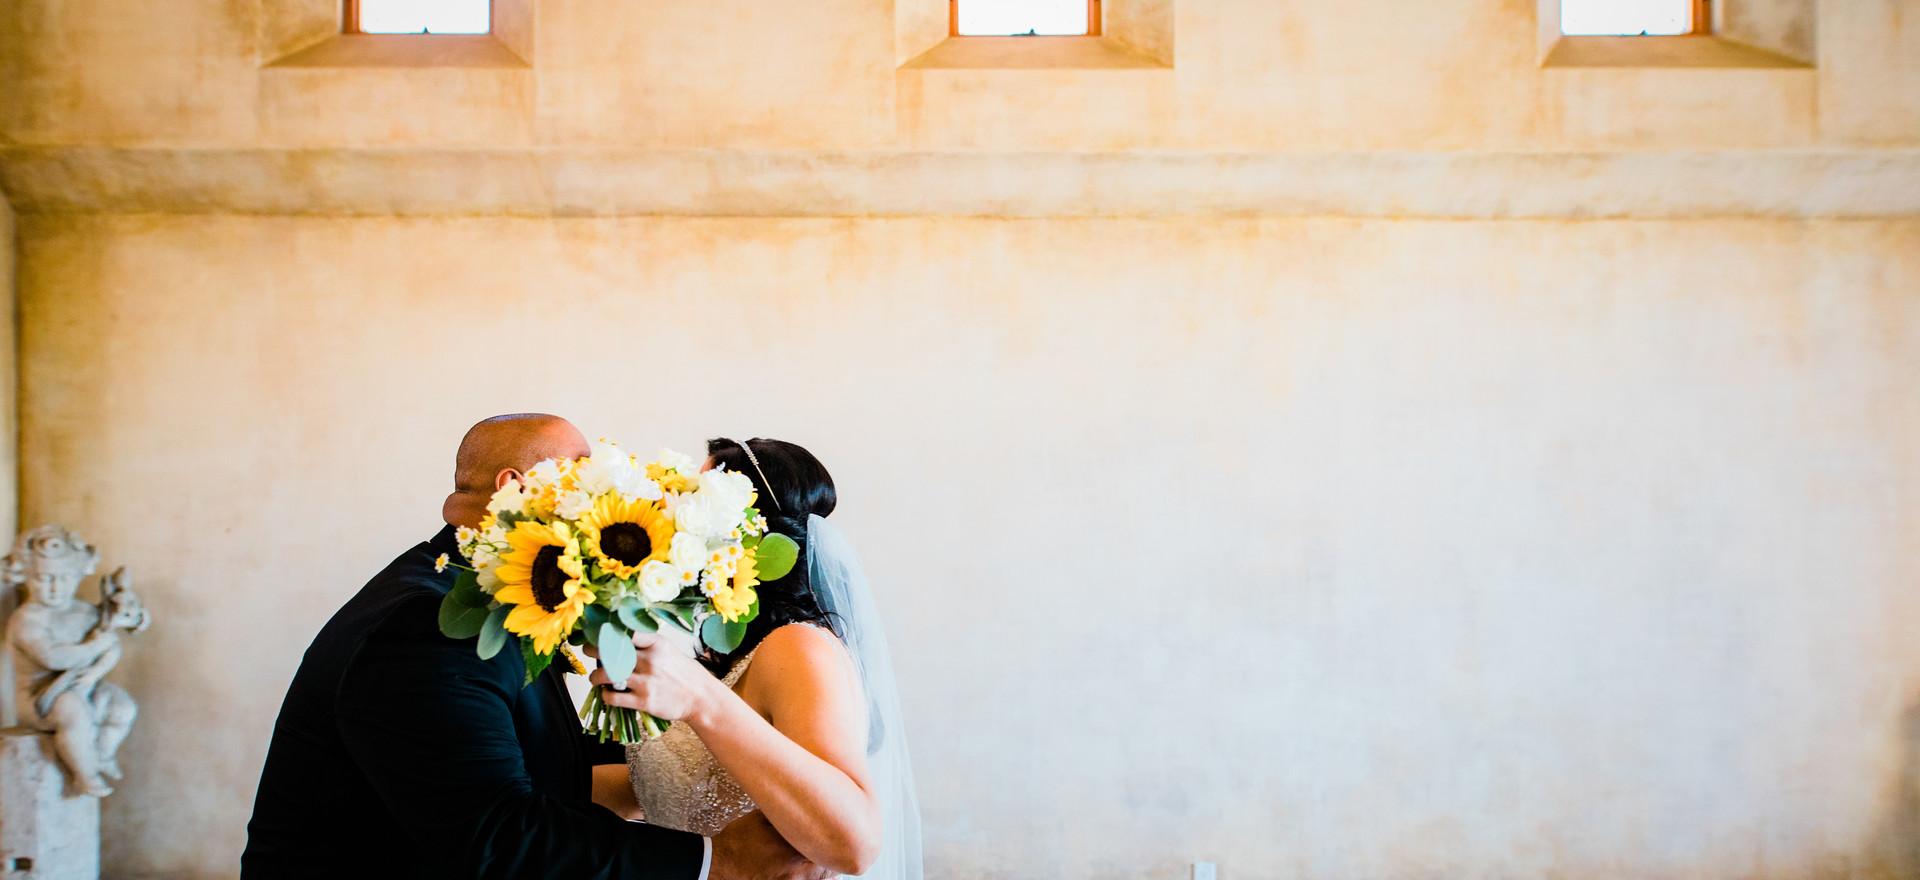 Jennifer+Robert ~ Married!_134.jpg